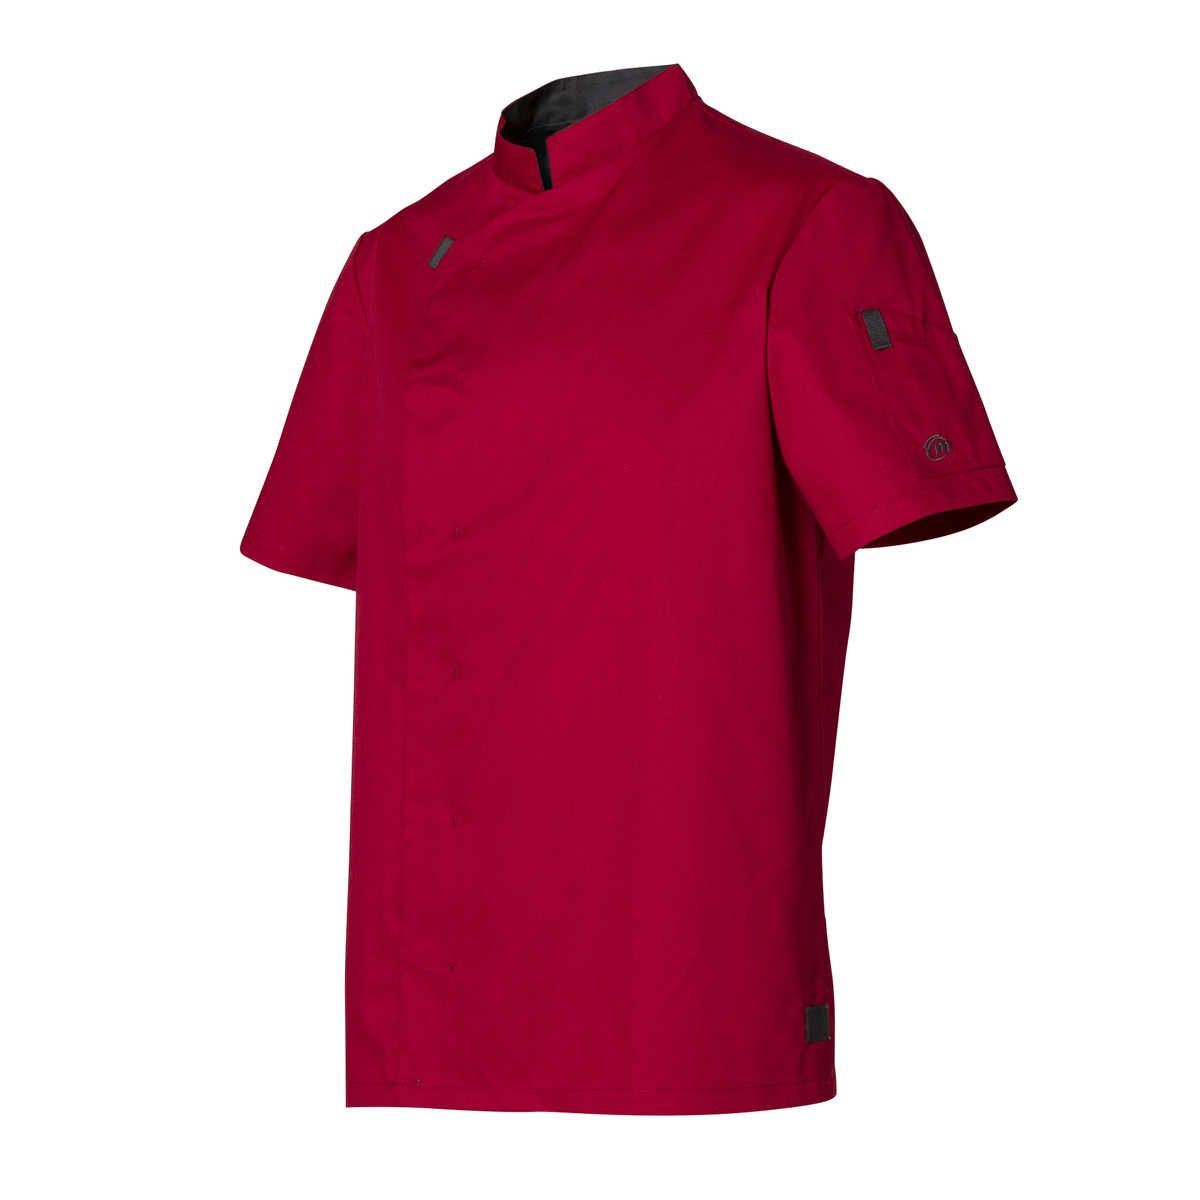 Veste de cuisine rouge taille 1 Shade Molinel